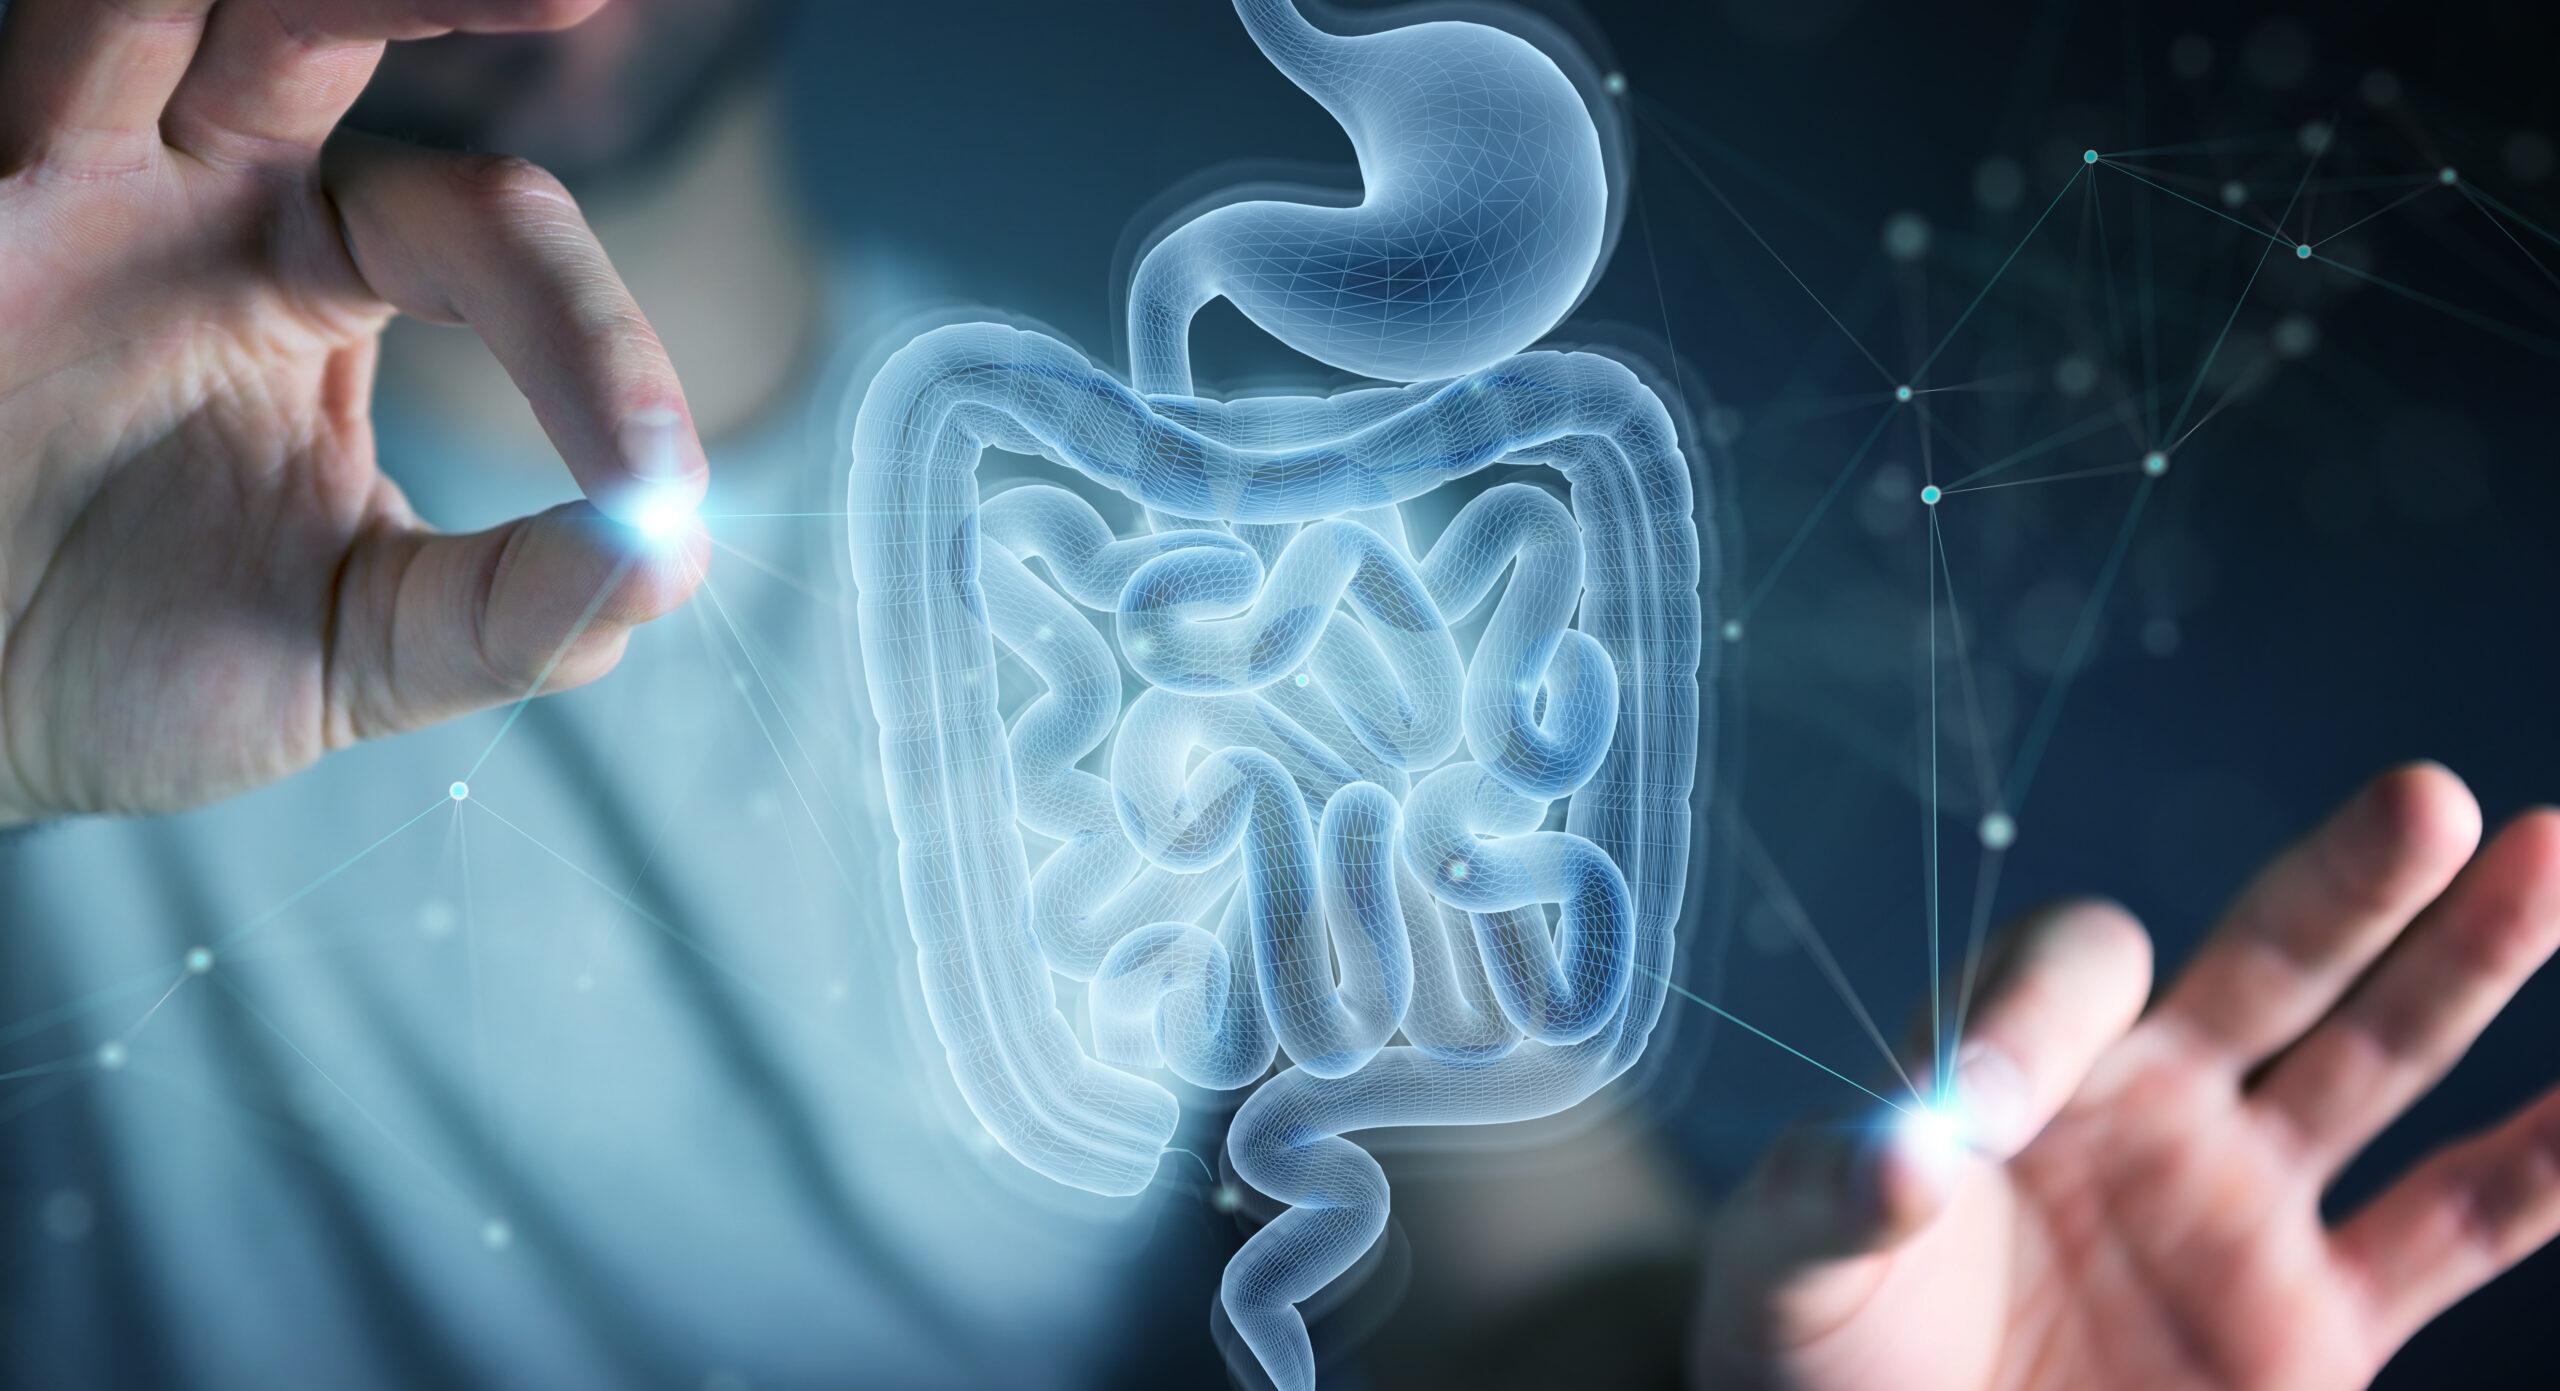 intestino 3D